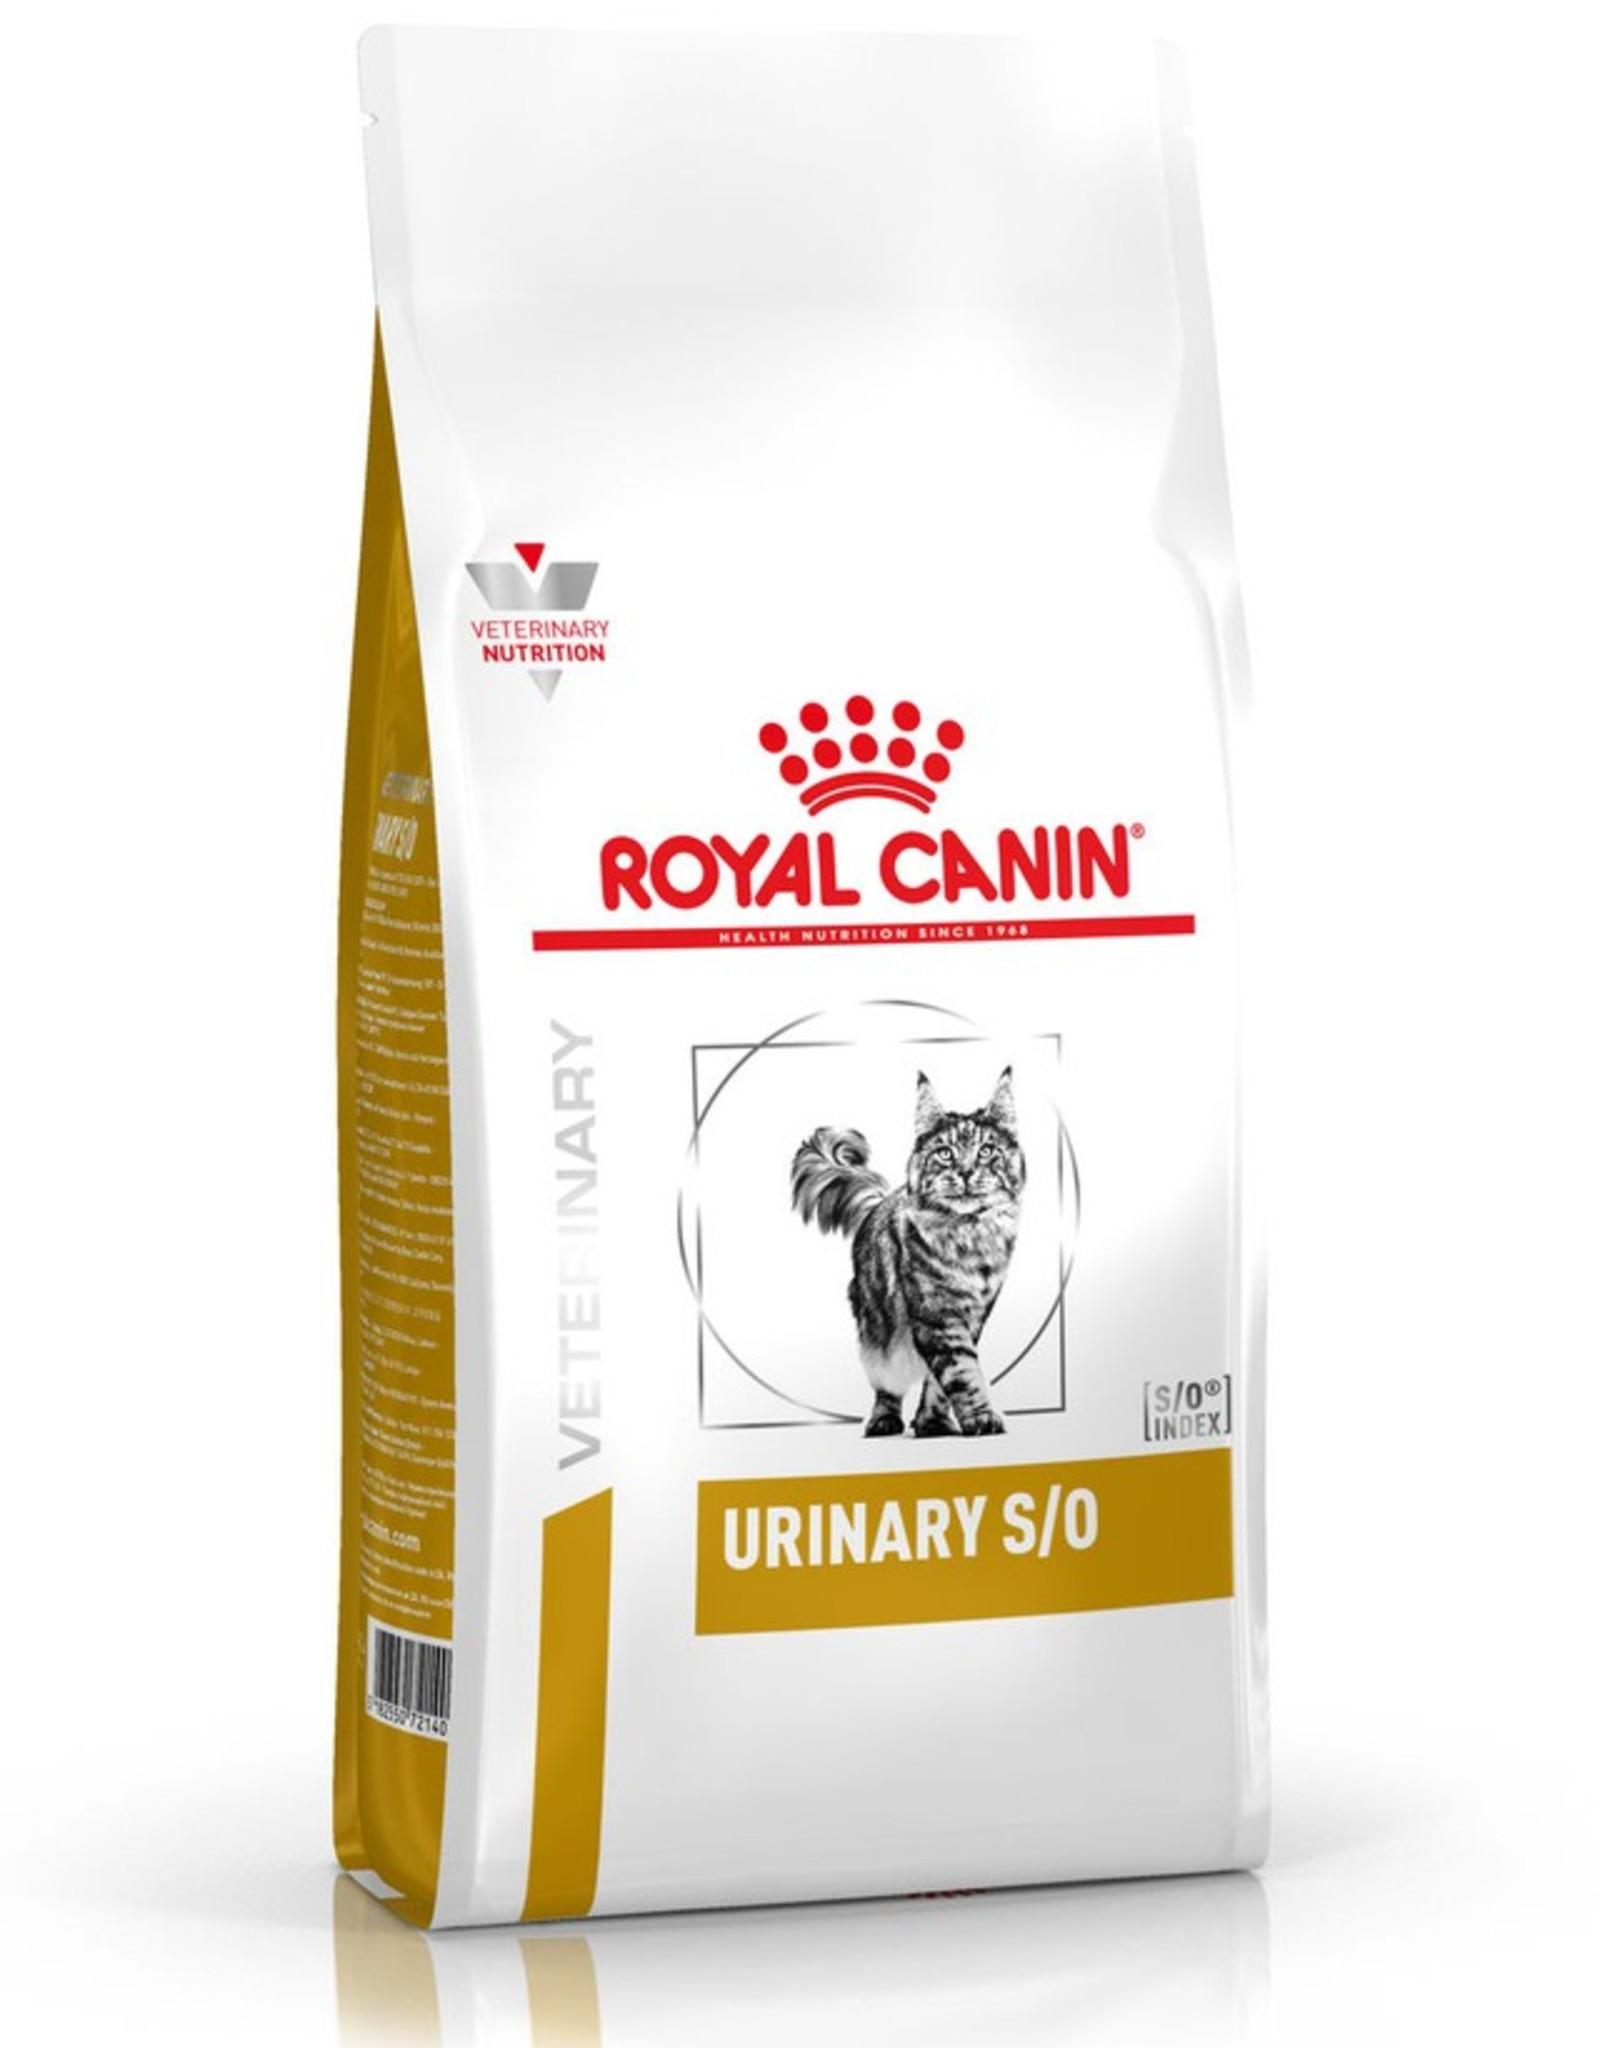 Royal Canin Royal Canin Urinary S/o Katze 7kg